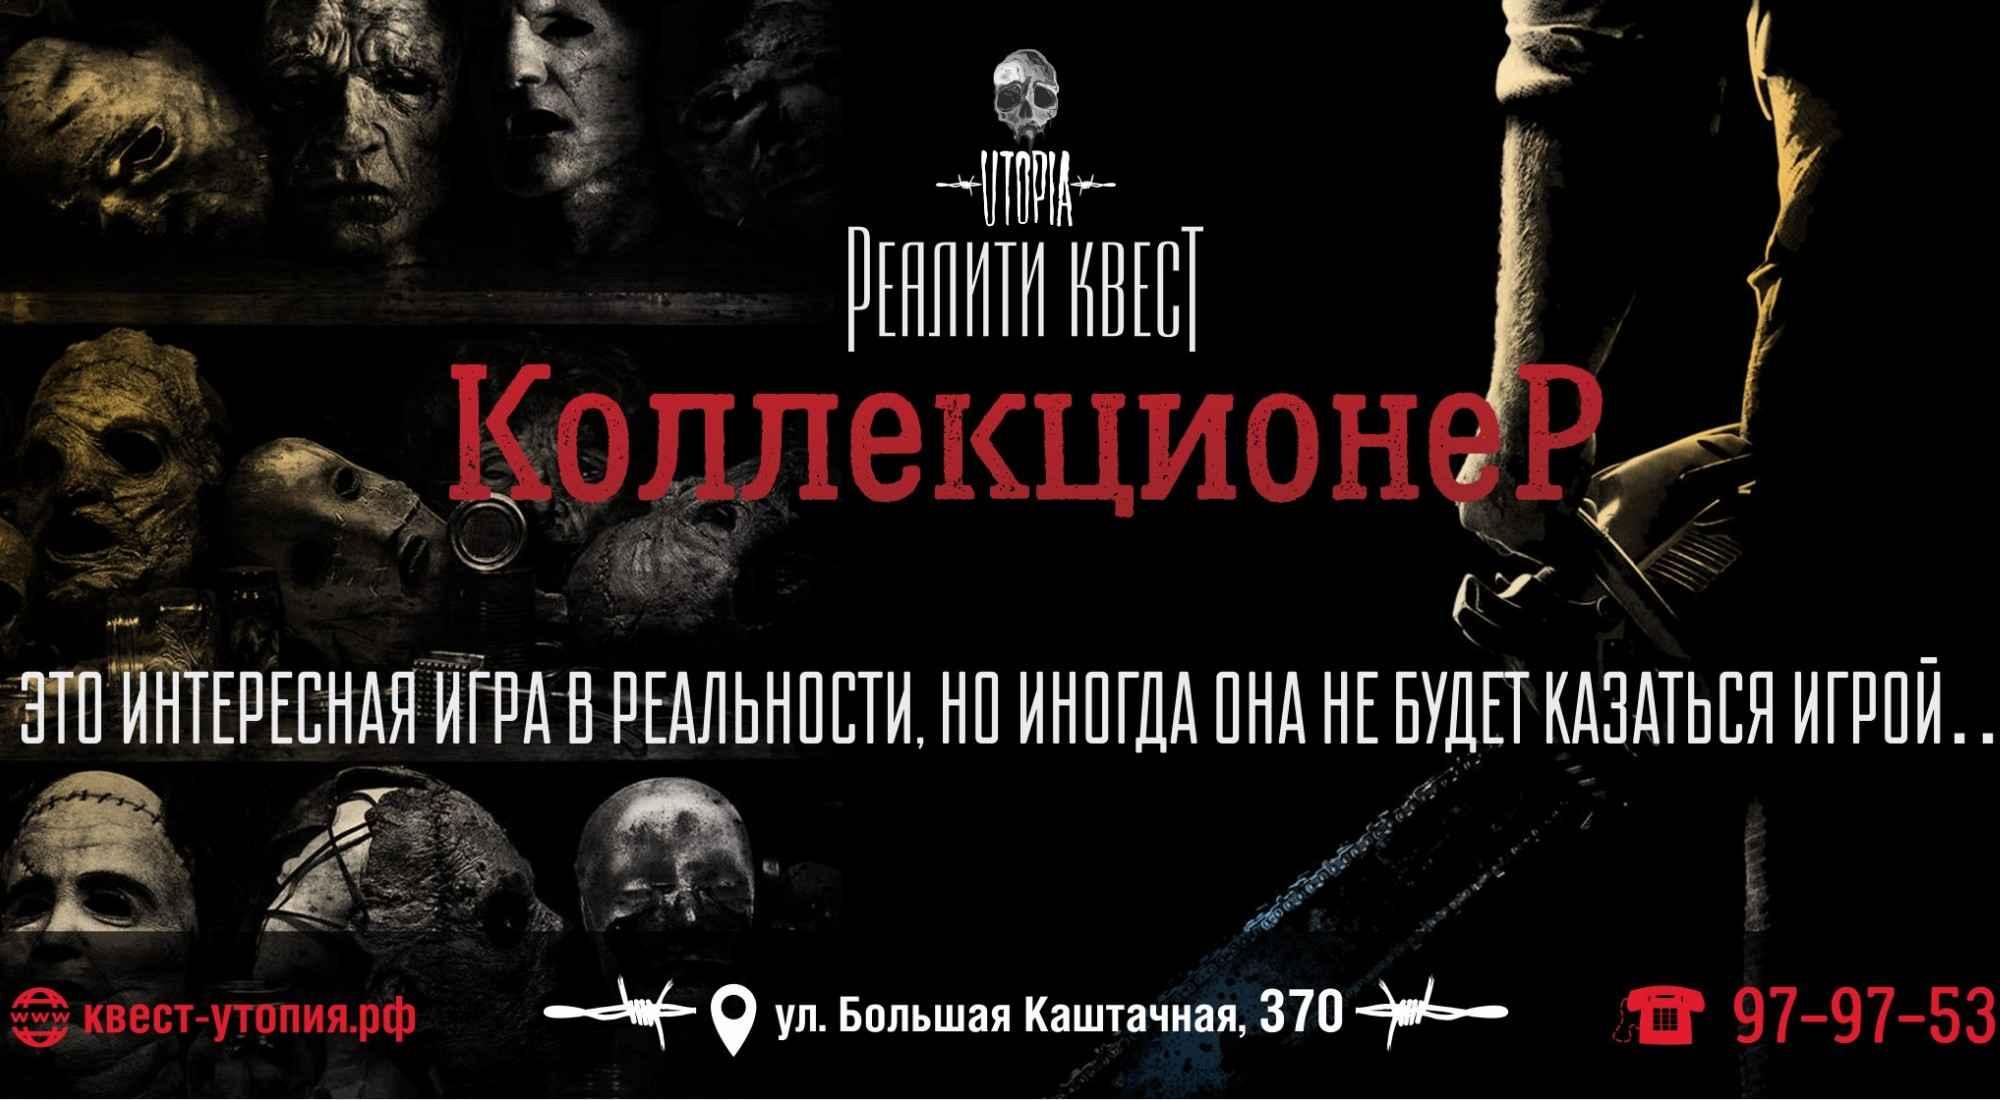 Перформанс Коллекционер в Томске фото 0